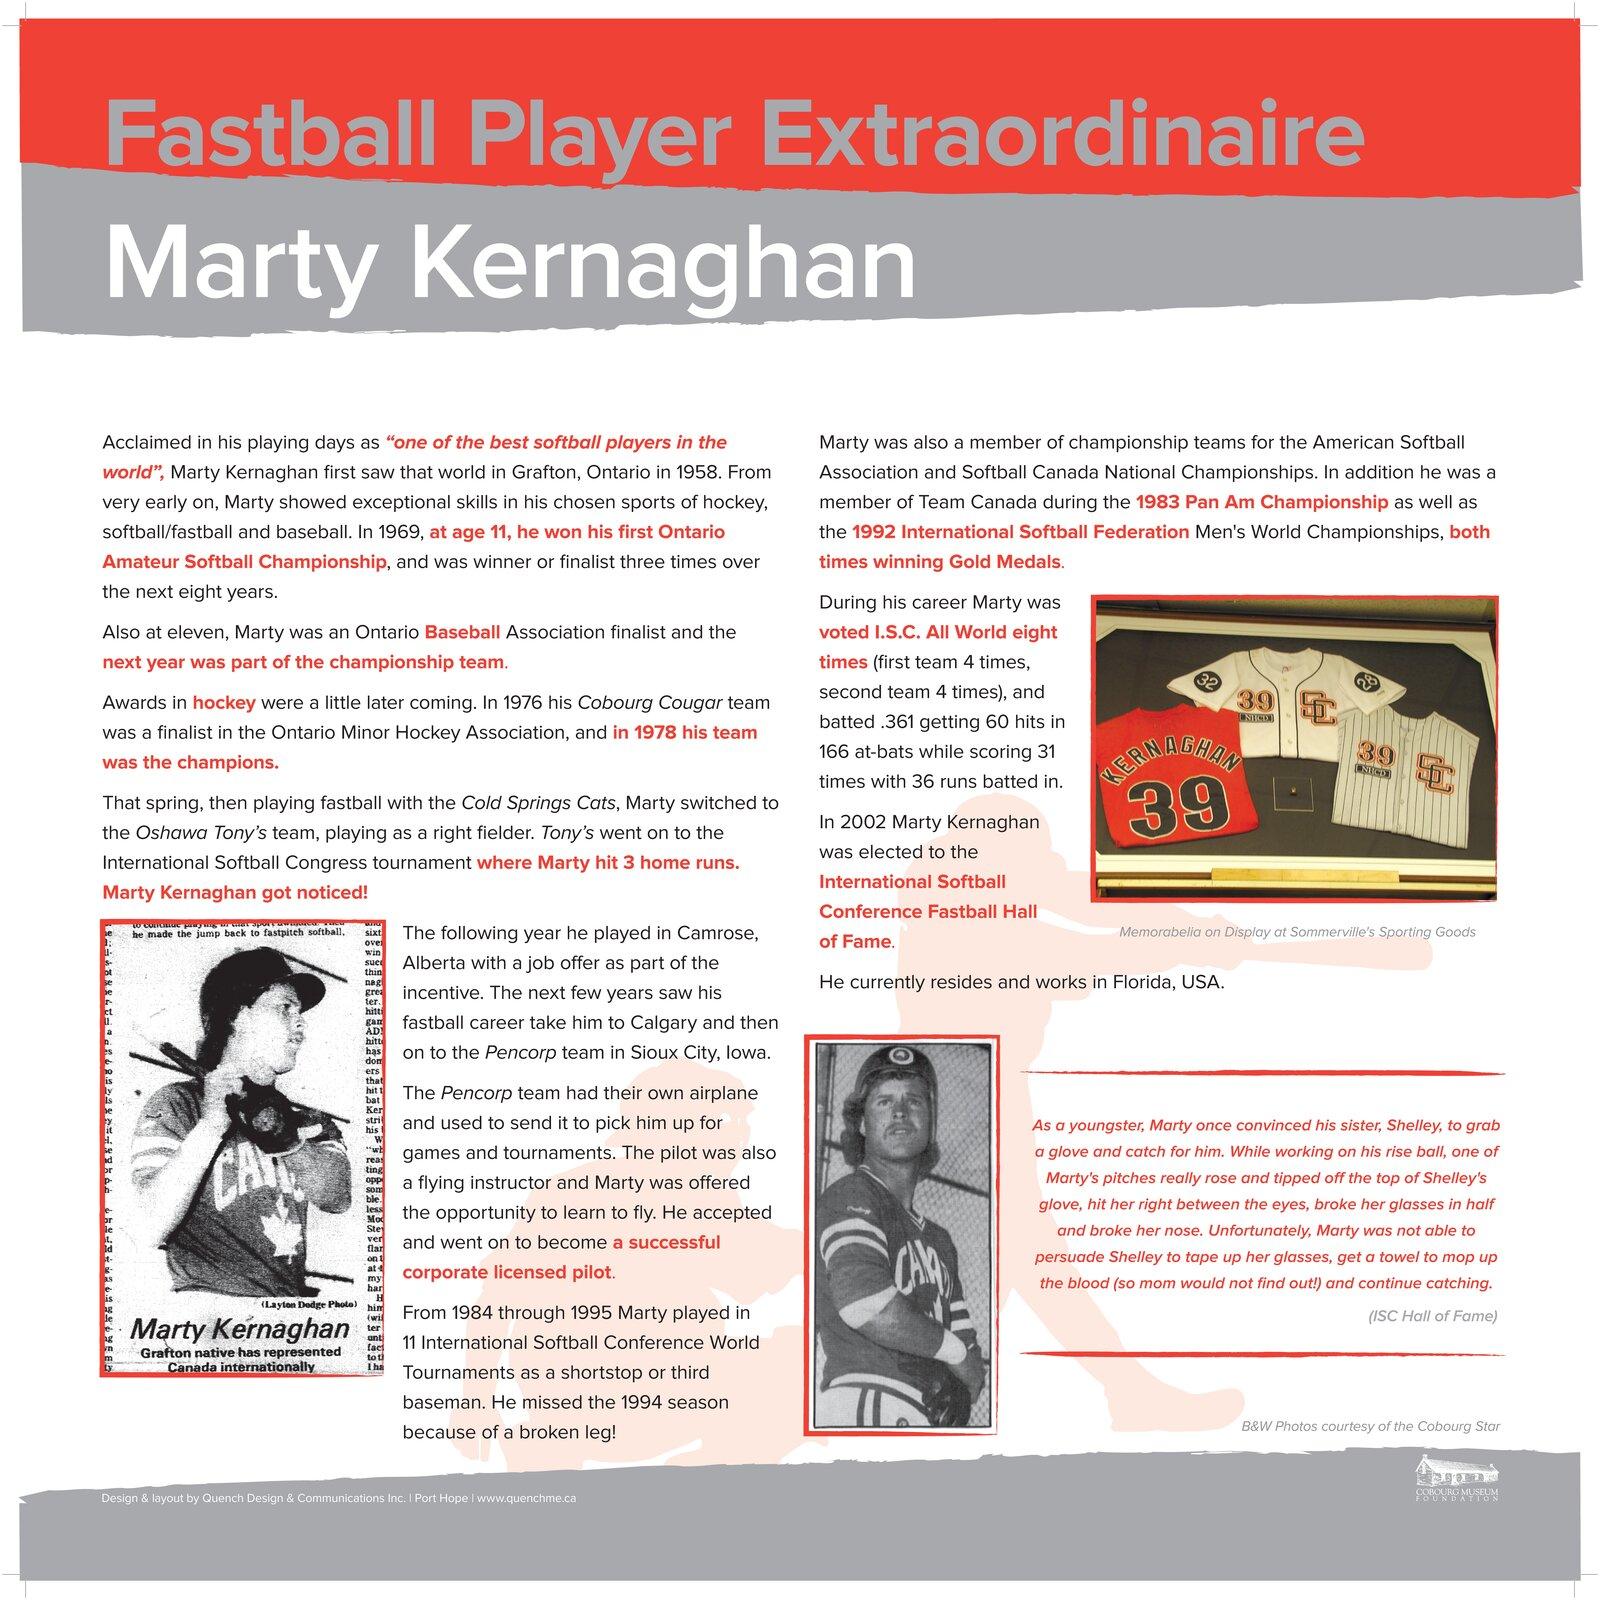 Marty Kernaghan - Multi talented athlete